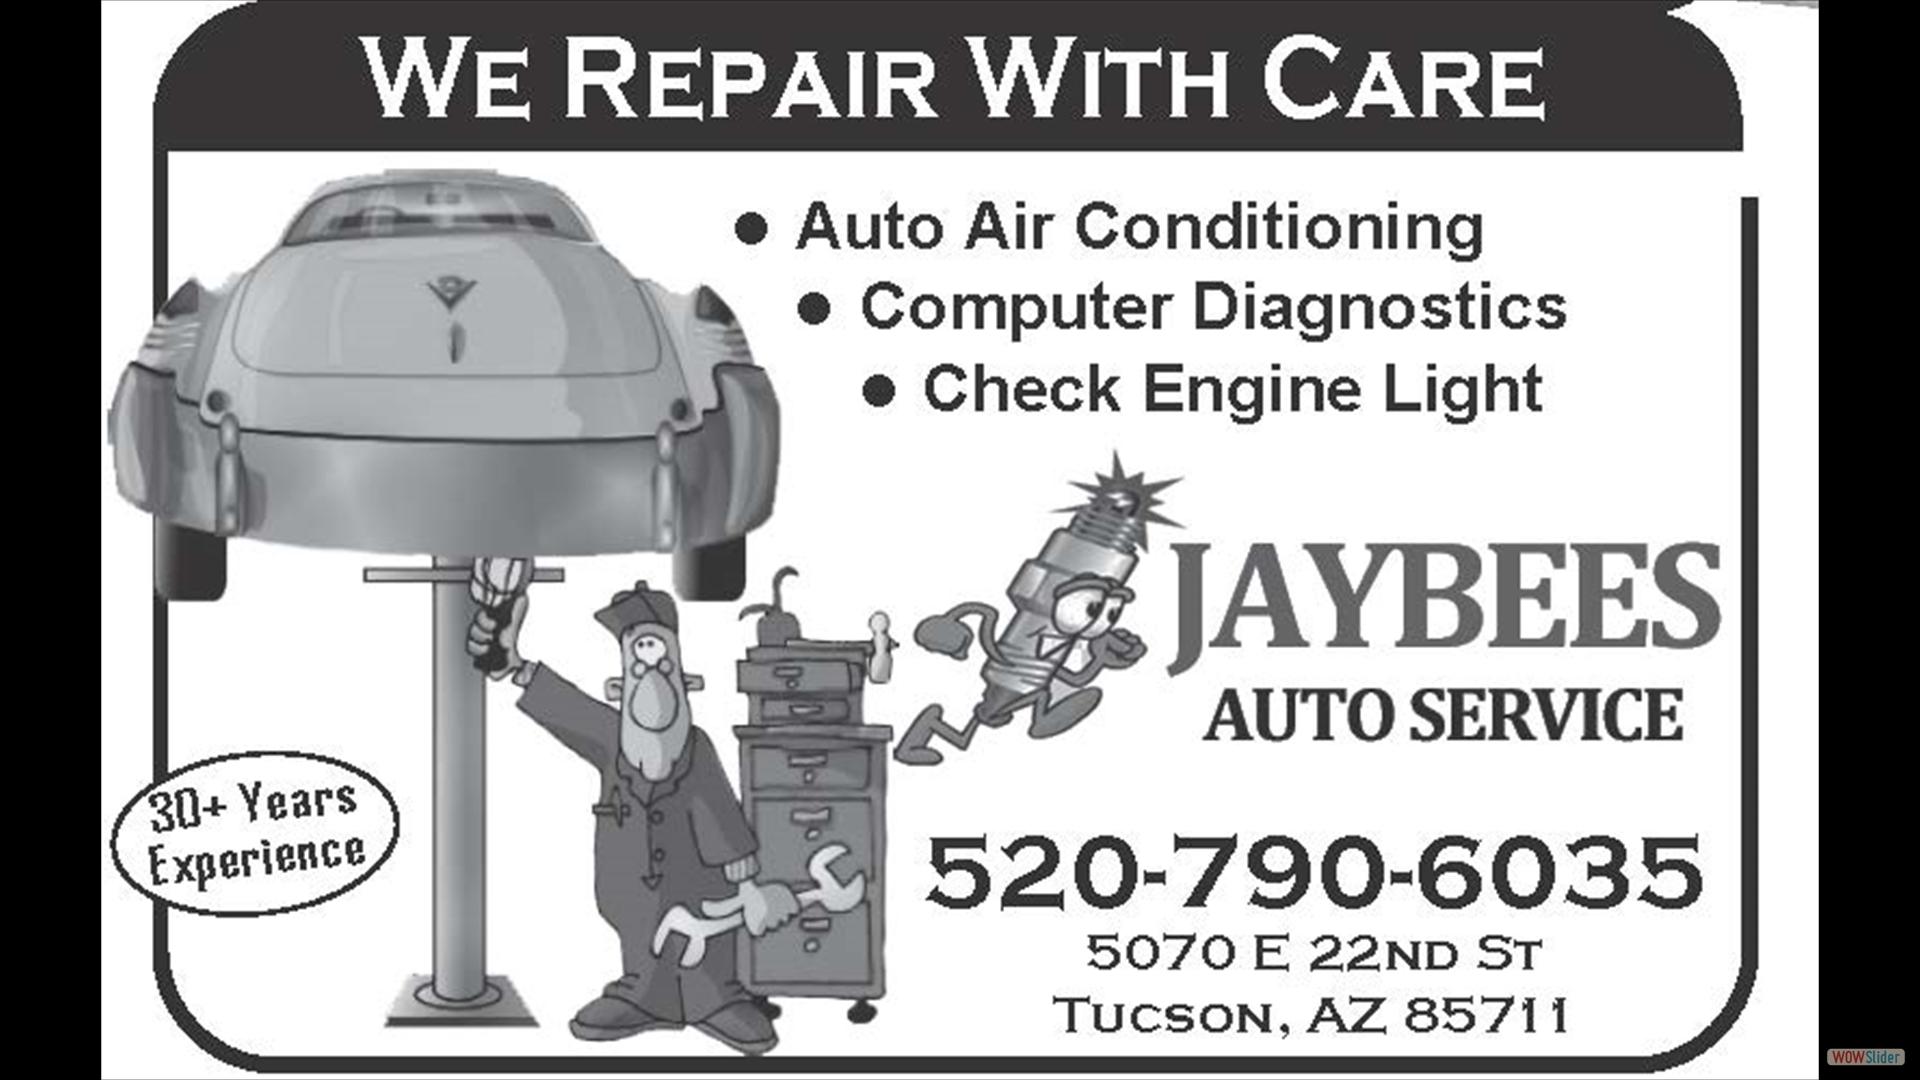 Jaybees Auto Service (2)